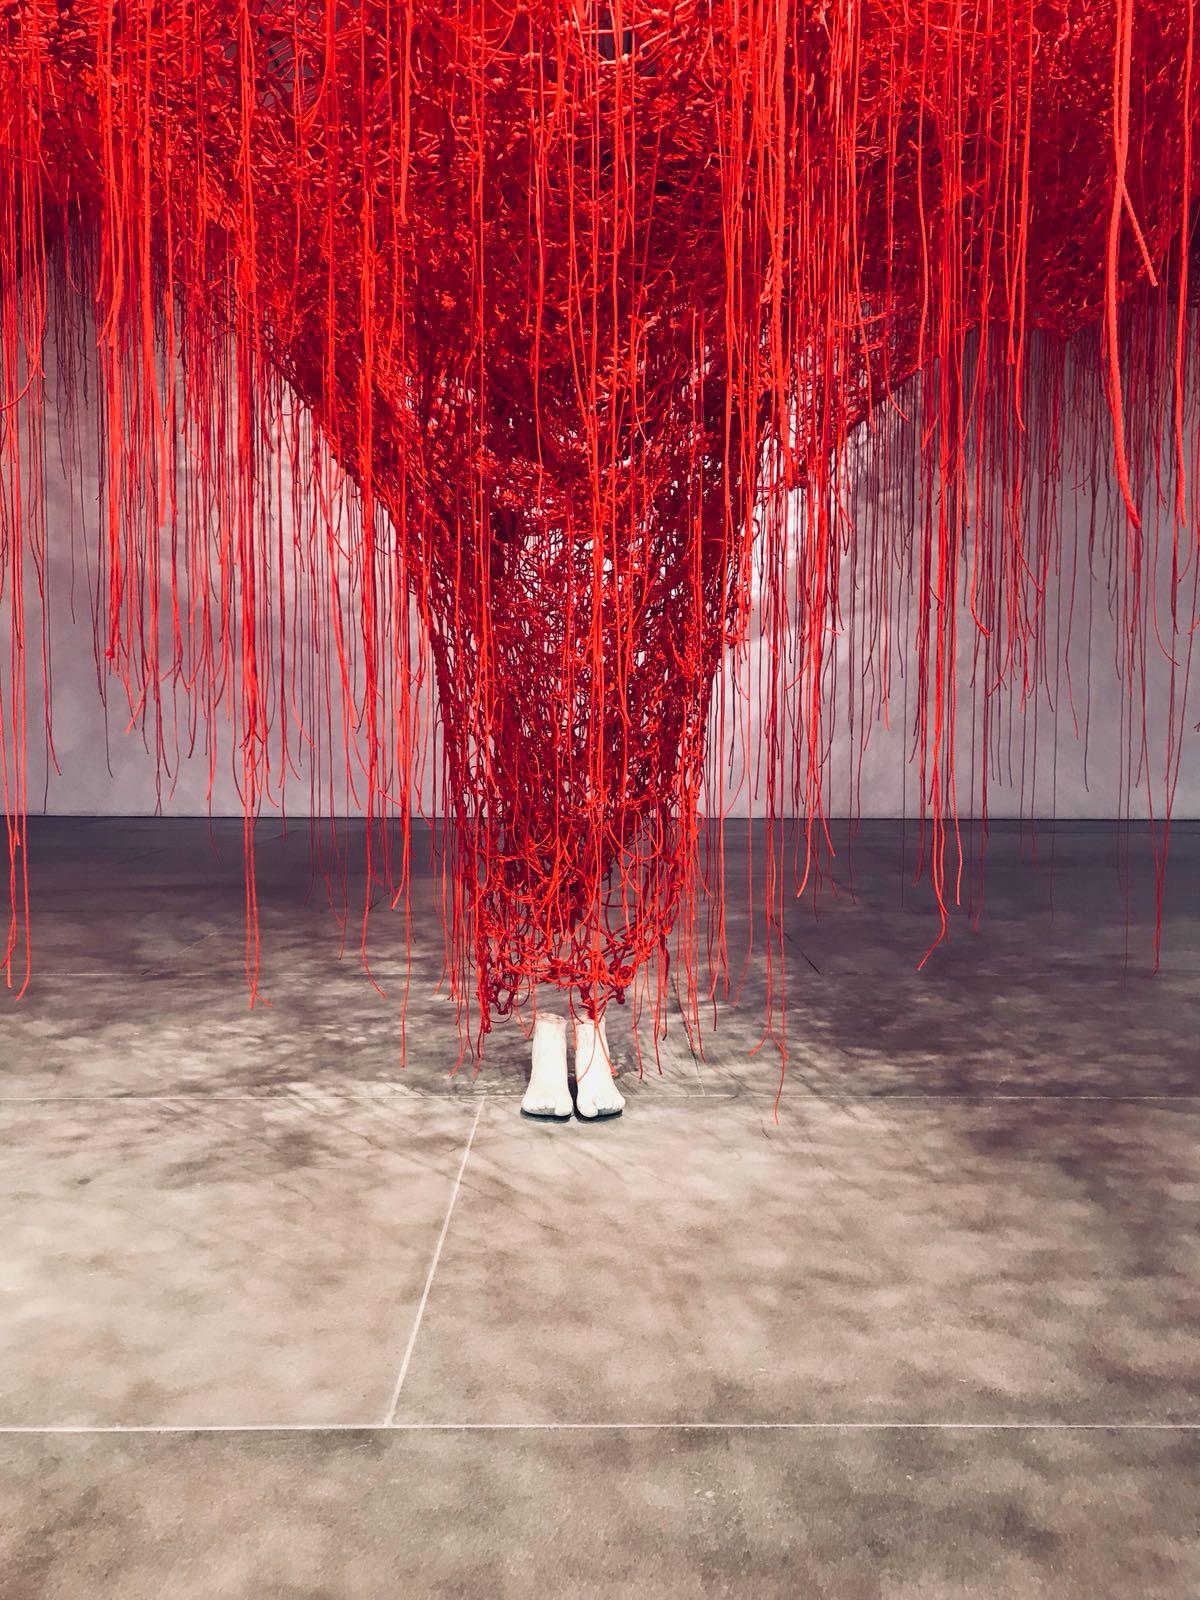 Chiharu Shiota - feet and net